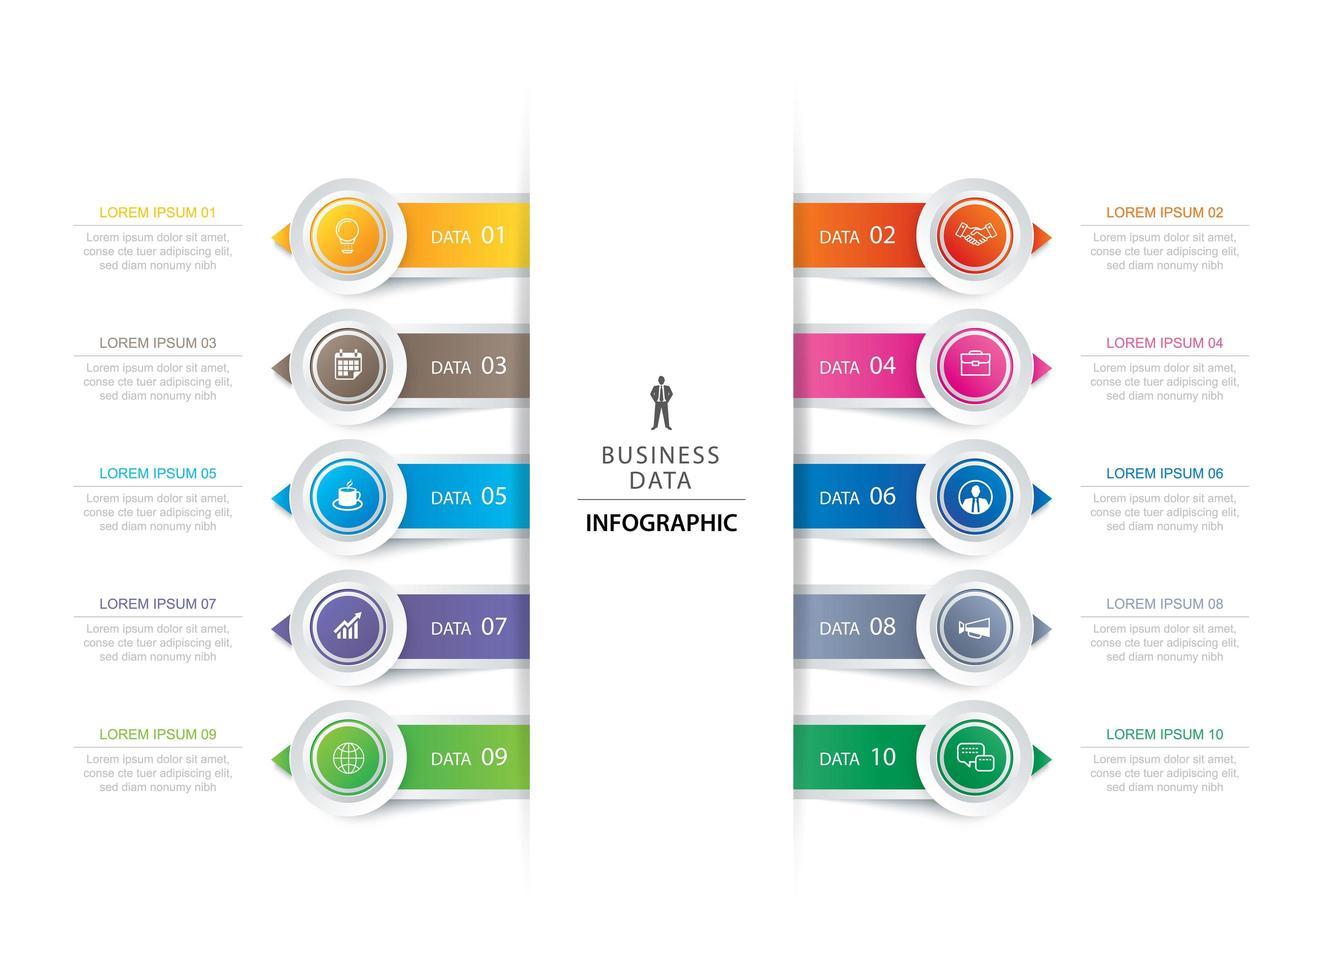 10 cerchio tab passo infografica vettore